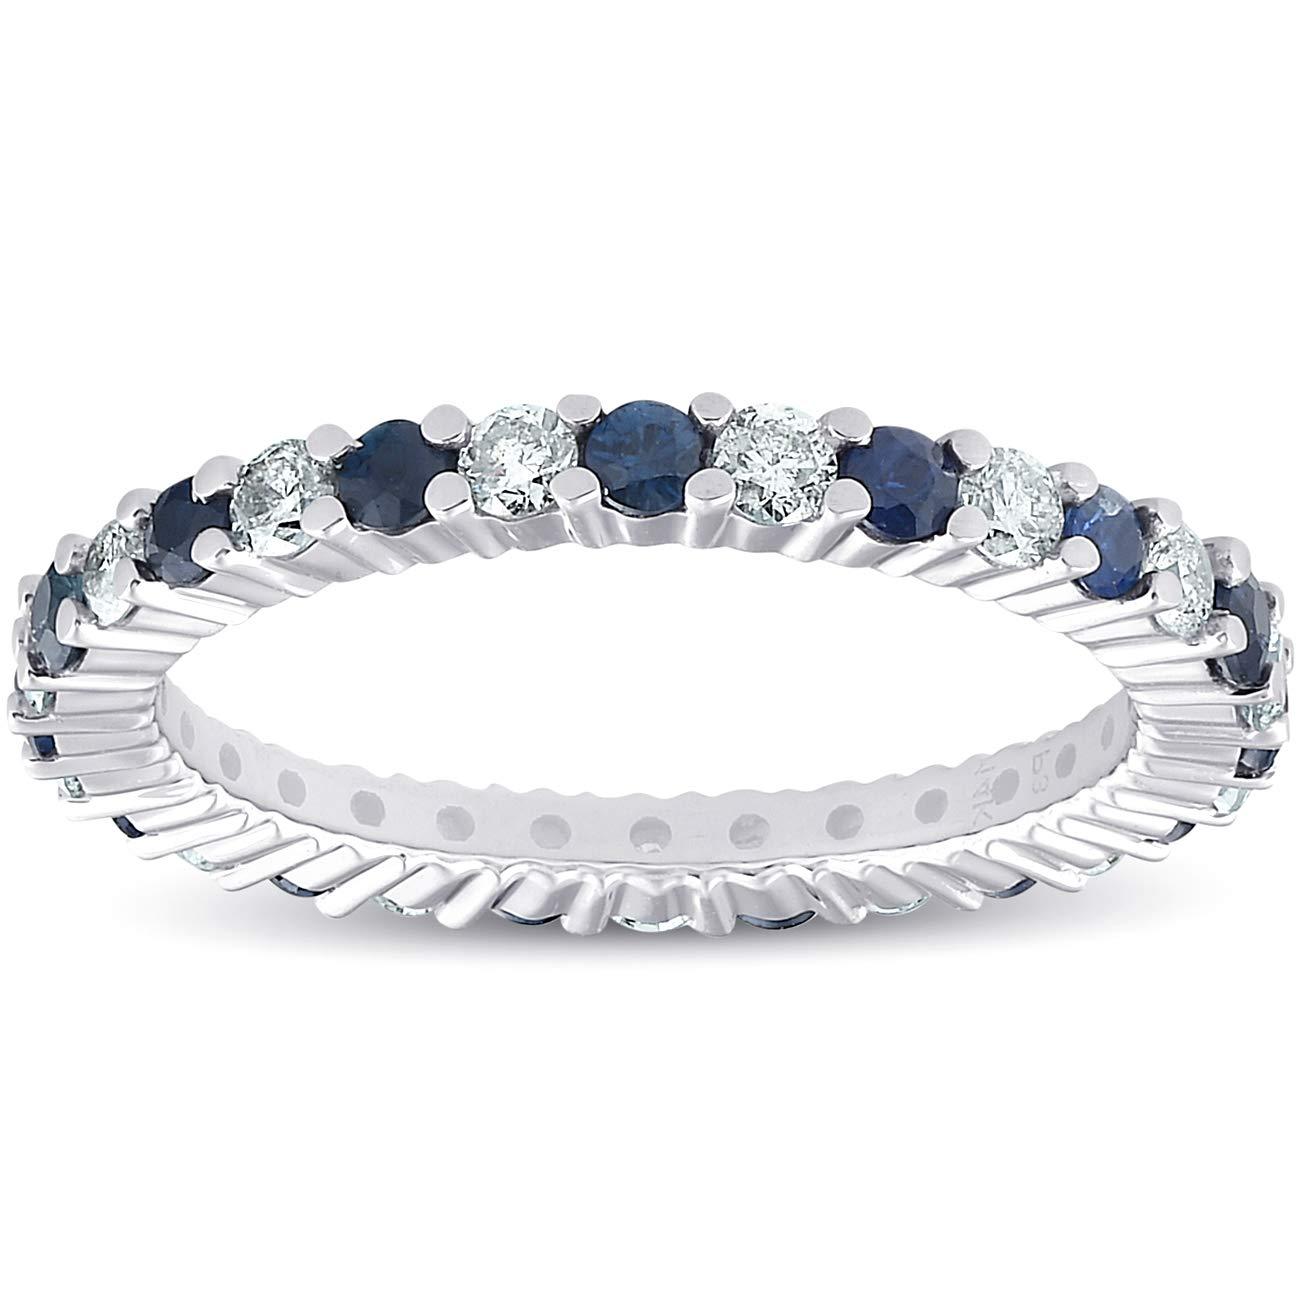 1 cttw Blue Sapphire Diamond Wedding Eternity Ring 14k White Gold - Size 6 by P3 POMPEII3